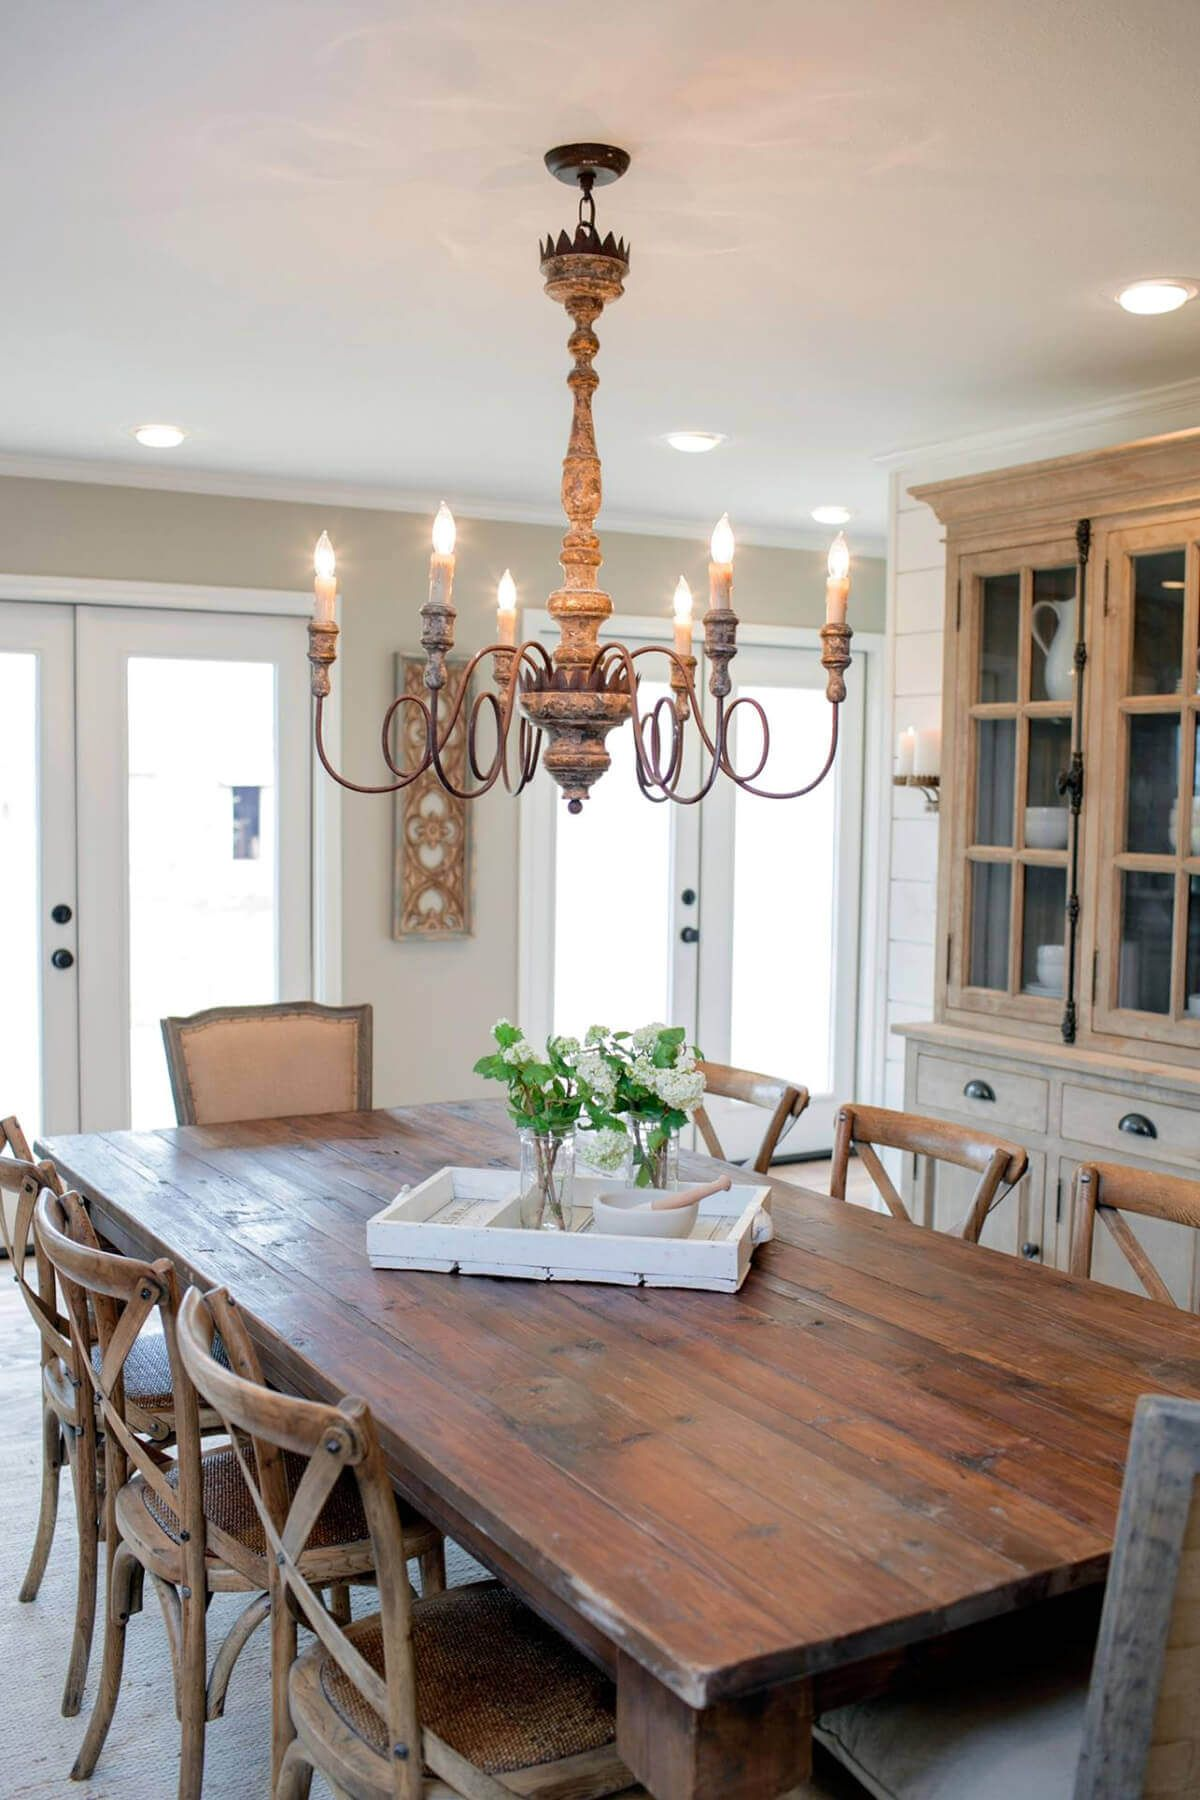 Fabulous Farmhouse Lighting Ideas To Brighten Up Your